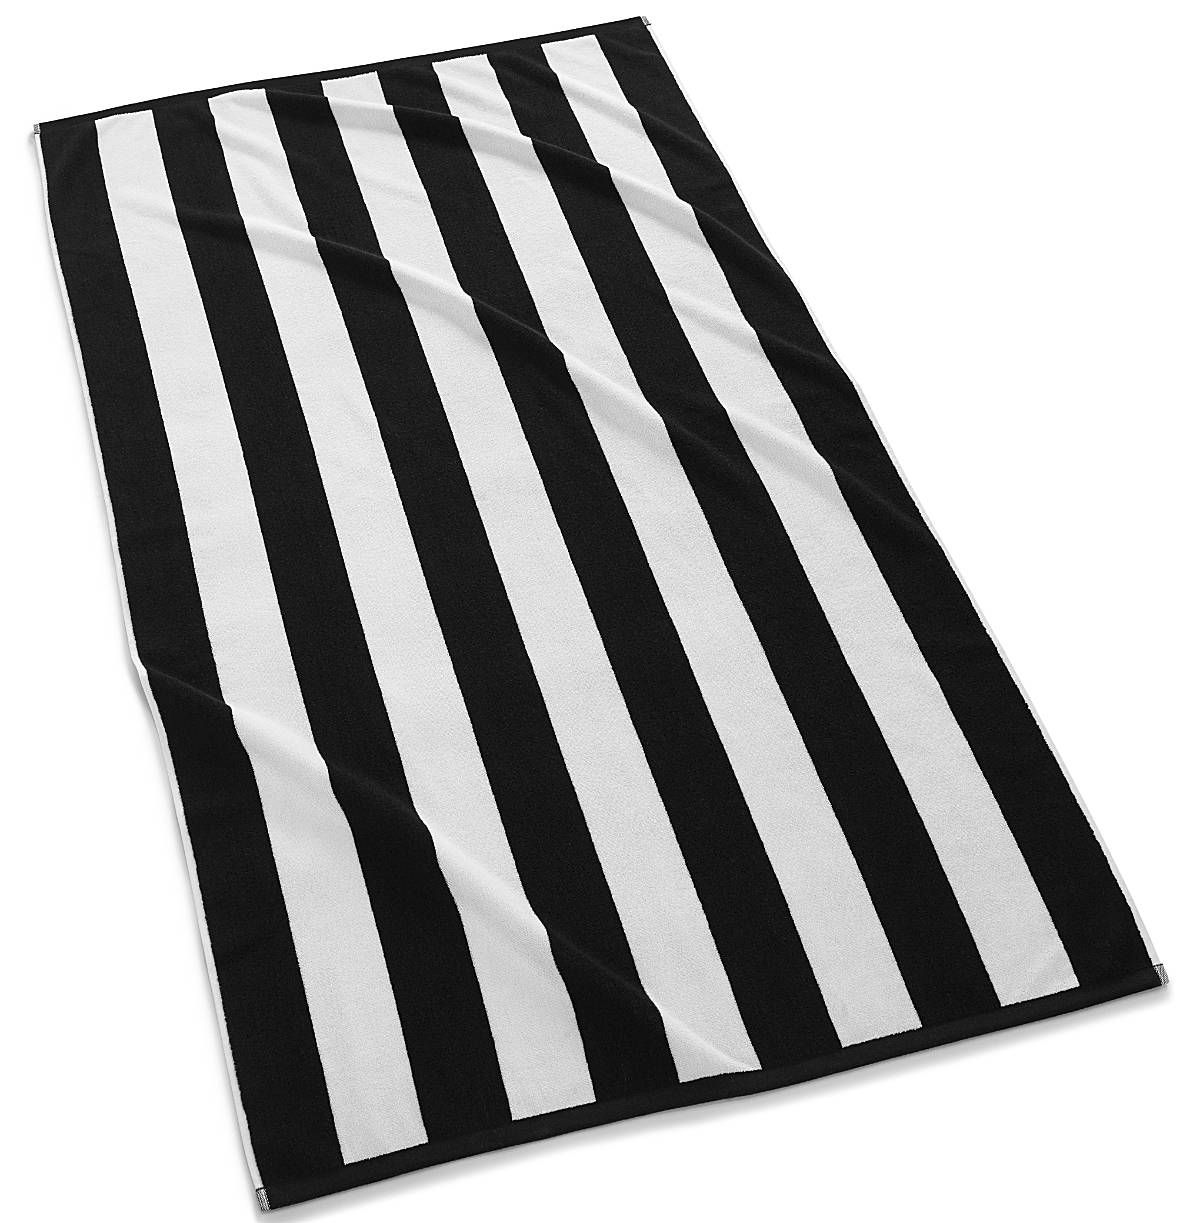 Cabana Stripe Beach Towel Black Striped Beach Towel Striped Towels Beach Towel